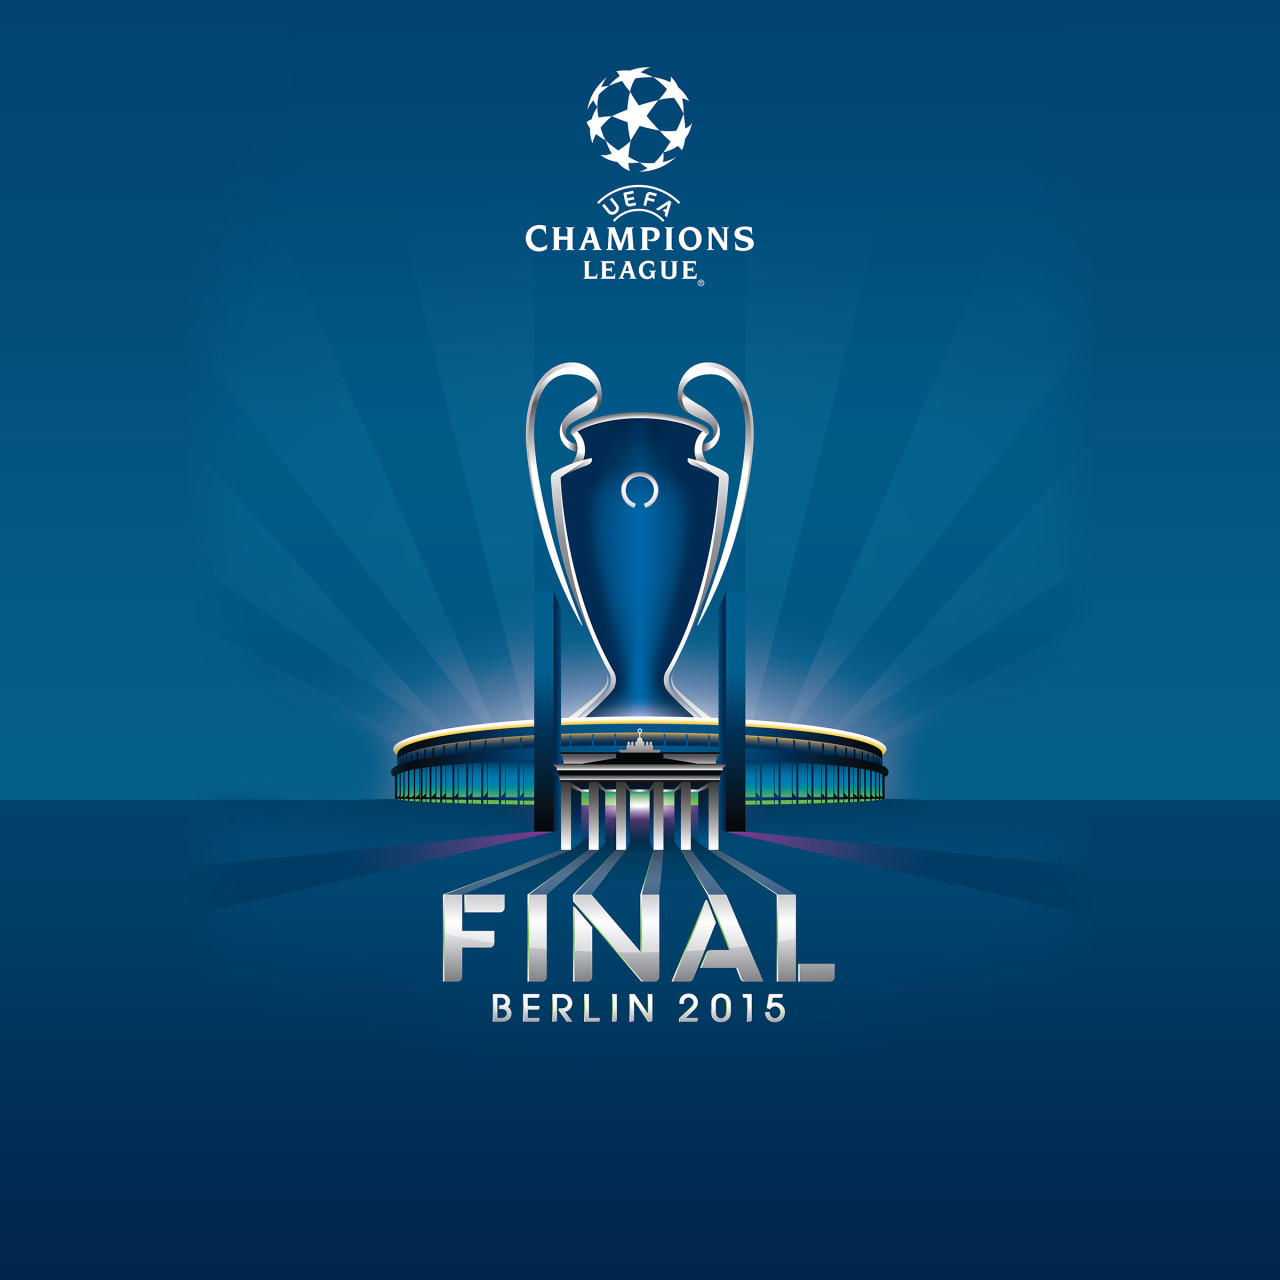 UEFA Champions League Berlin HD Wallpaper 3176 1280x1280